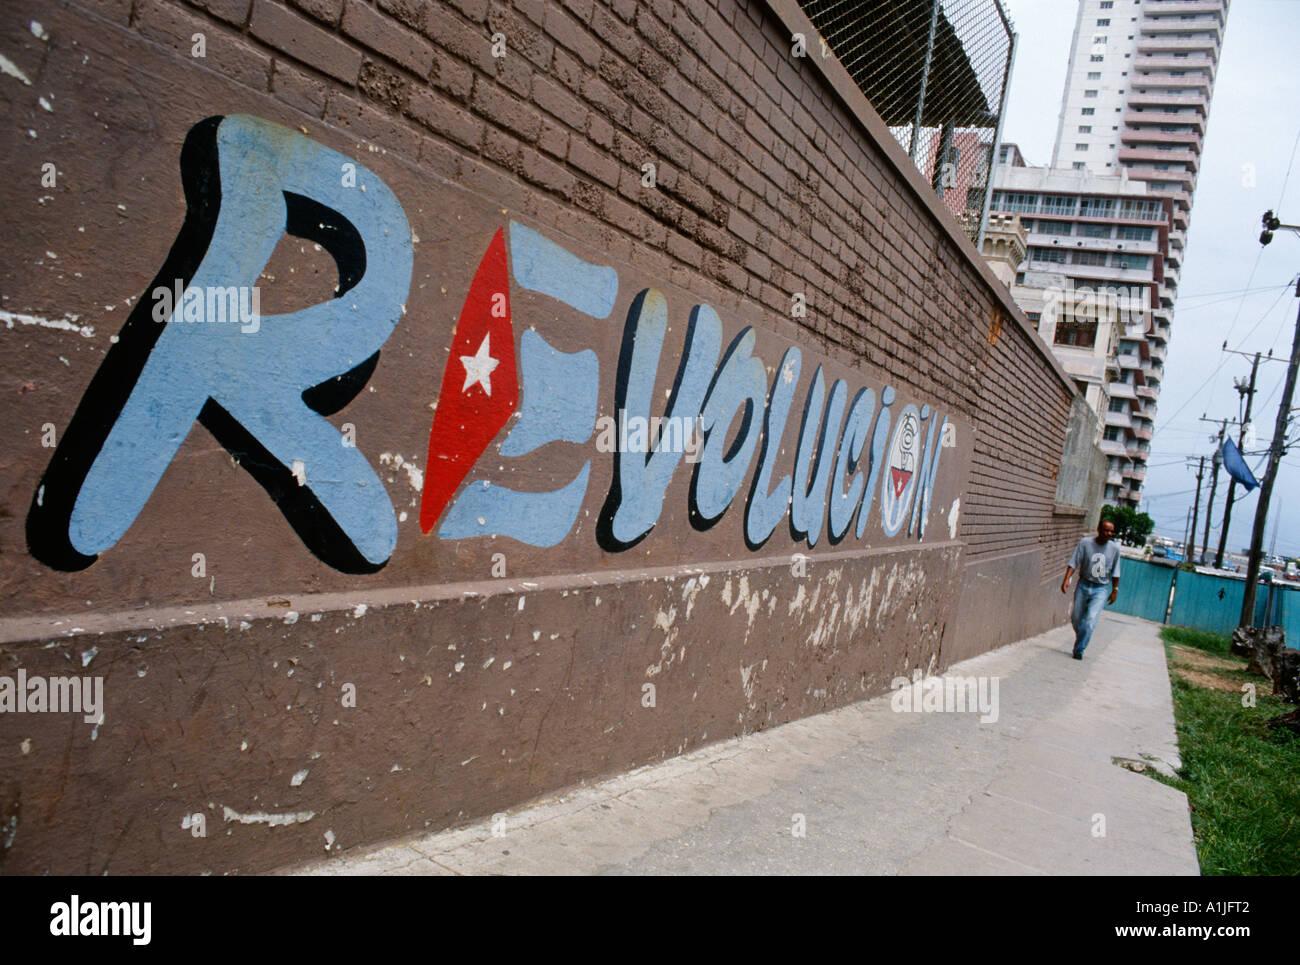 Havana Cuba Revolutionary slogan painted on wall - Stock Image